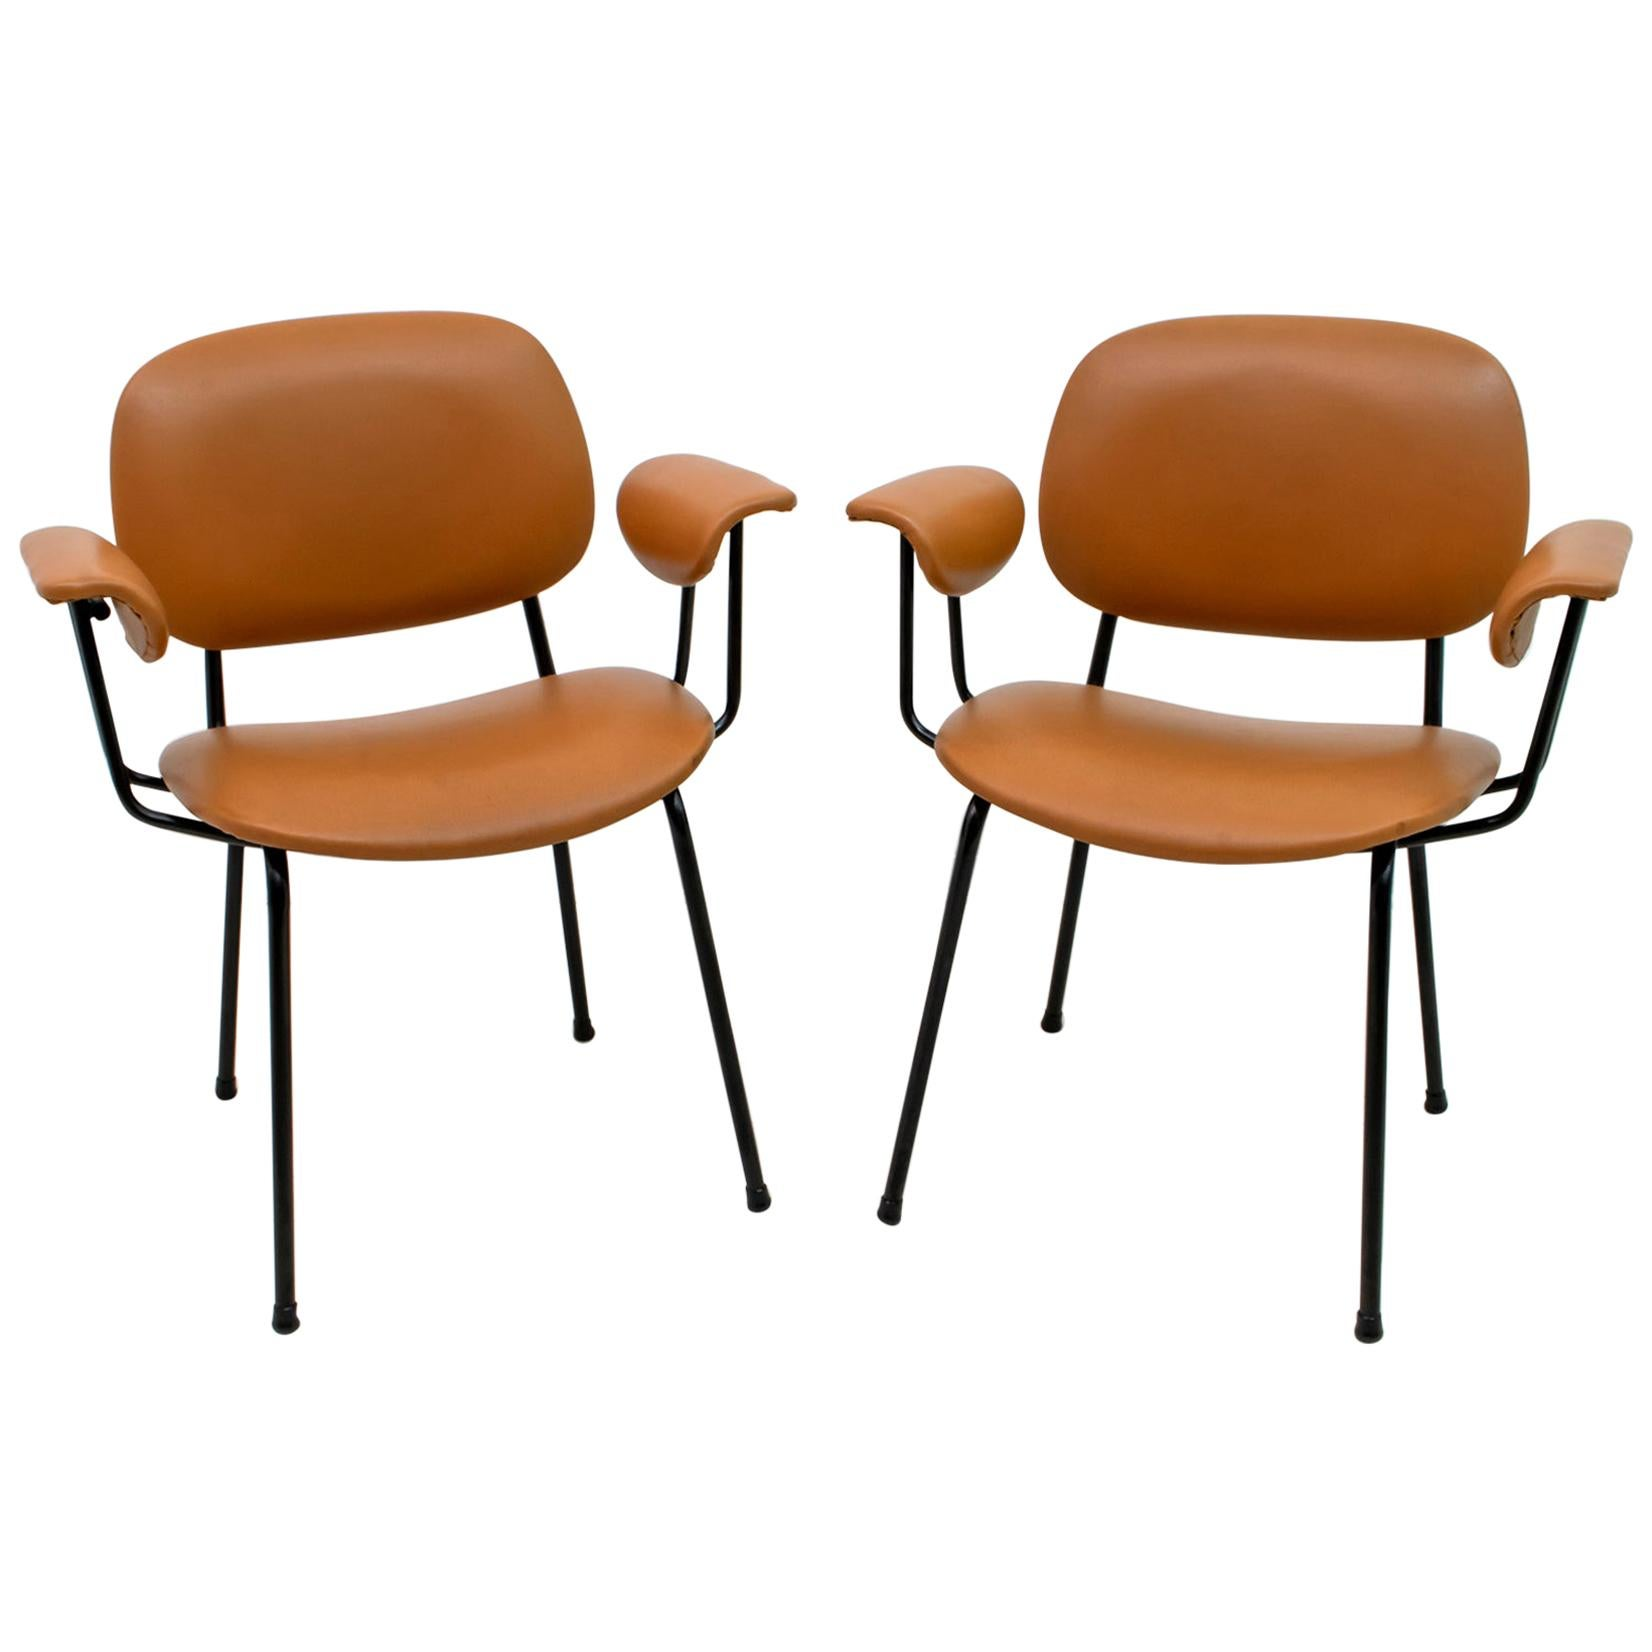 Pair of Gastone Rinaldi Mid-Century Modern Italian Armchairs for RIMA, 1960s